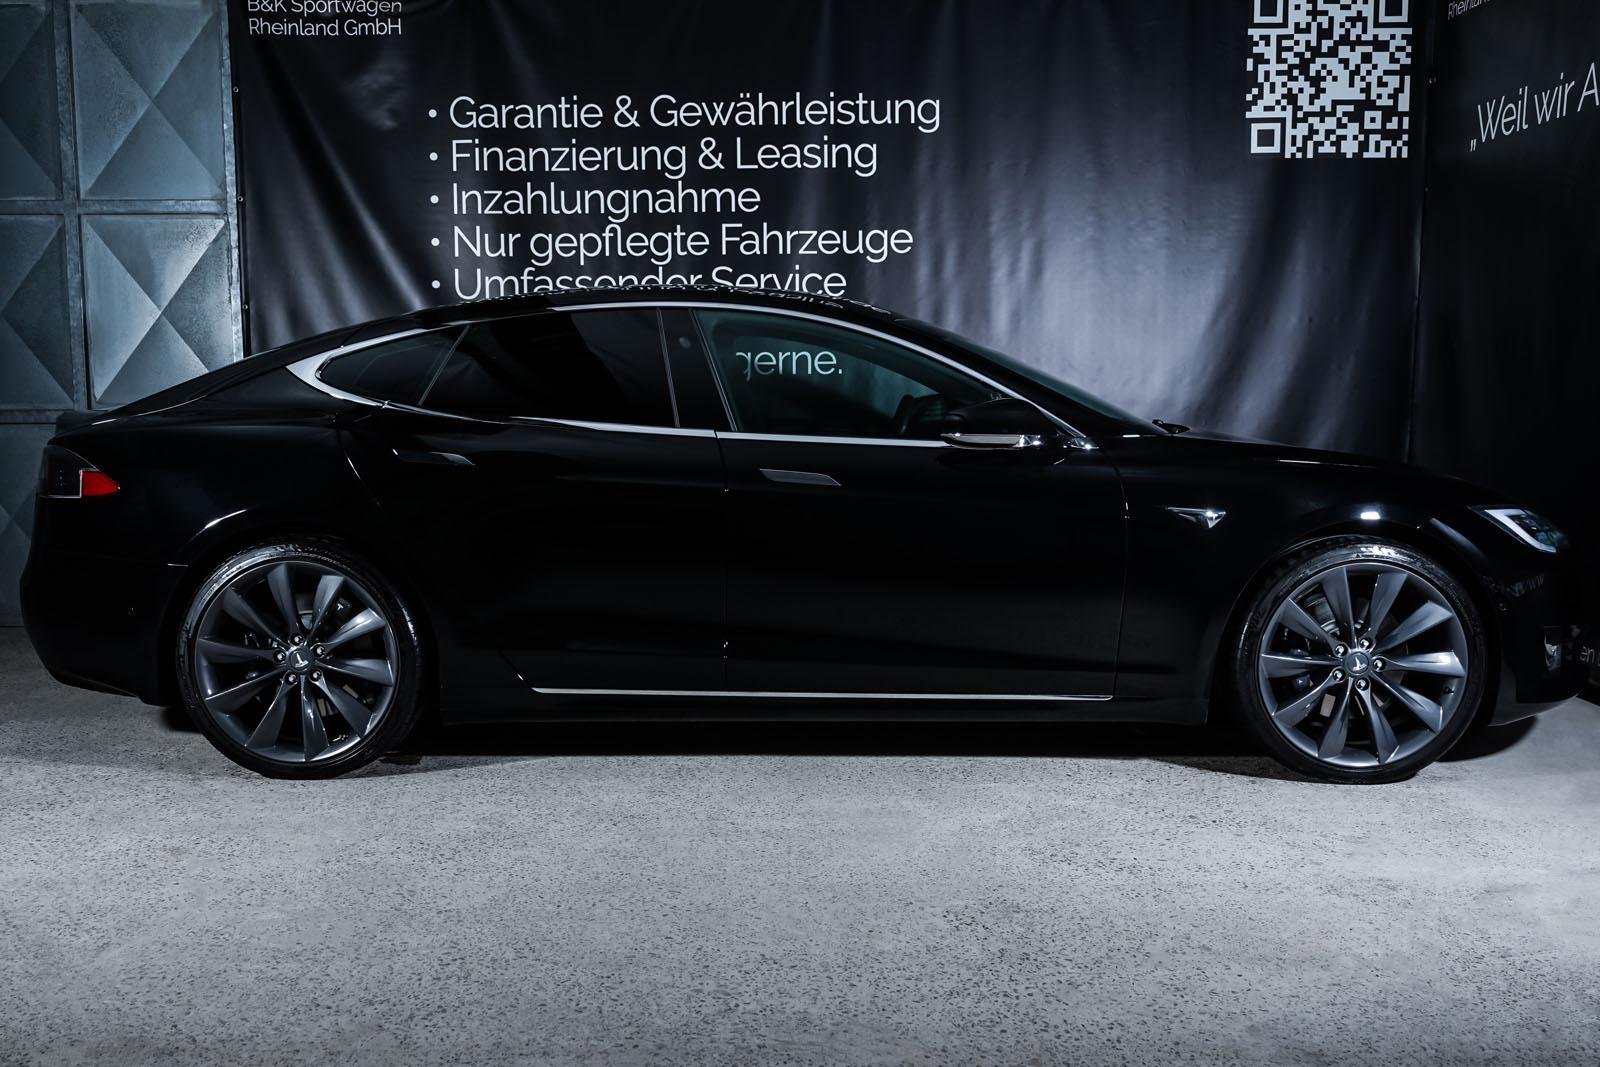 Tesla_ModelS_Schwarz_Schwarz_TES-6166_15_w